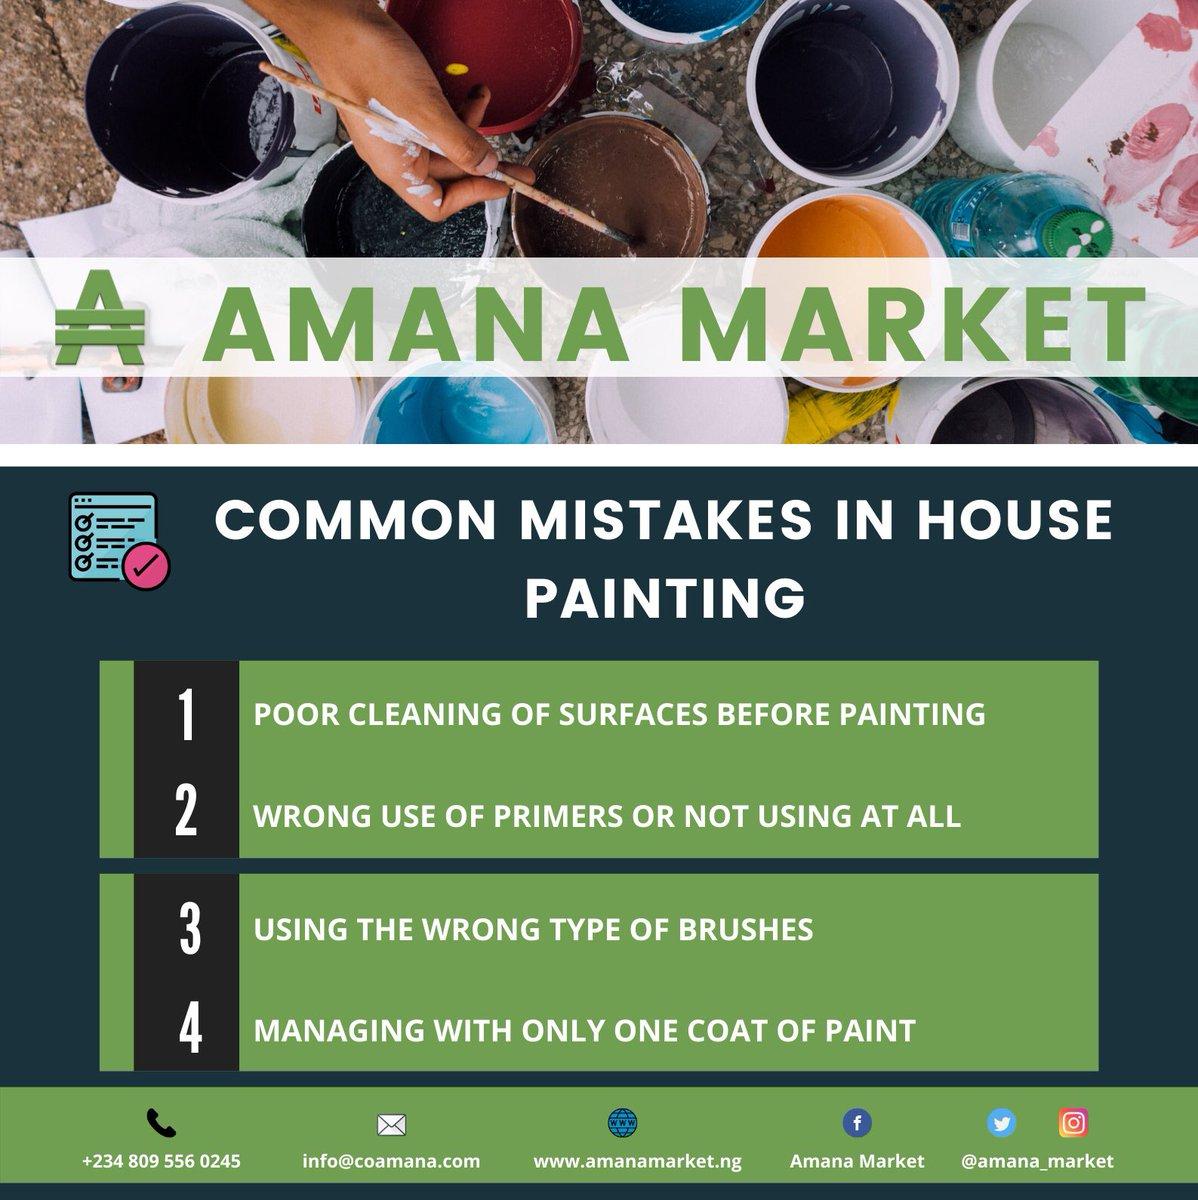 House painters! Register to Amana Market for free and meet new customers! (Link below) @GovKaduna @InvestKaduna —- Masu fentin gidaje, kaho ku yi rajista akan Kasuwar Amana  http://amanamarket.ng - #house #painting #housepainting #Amanamarketpic.twitter.com/eKl0oie6LS